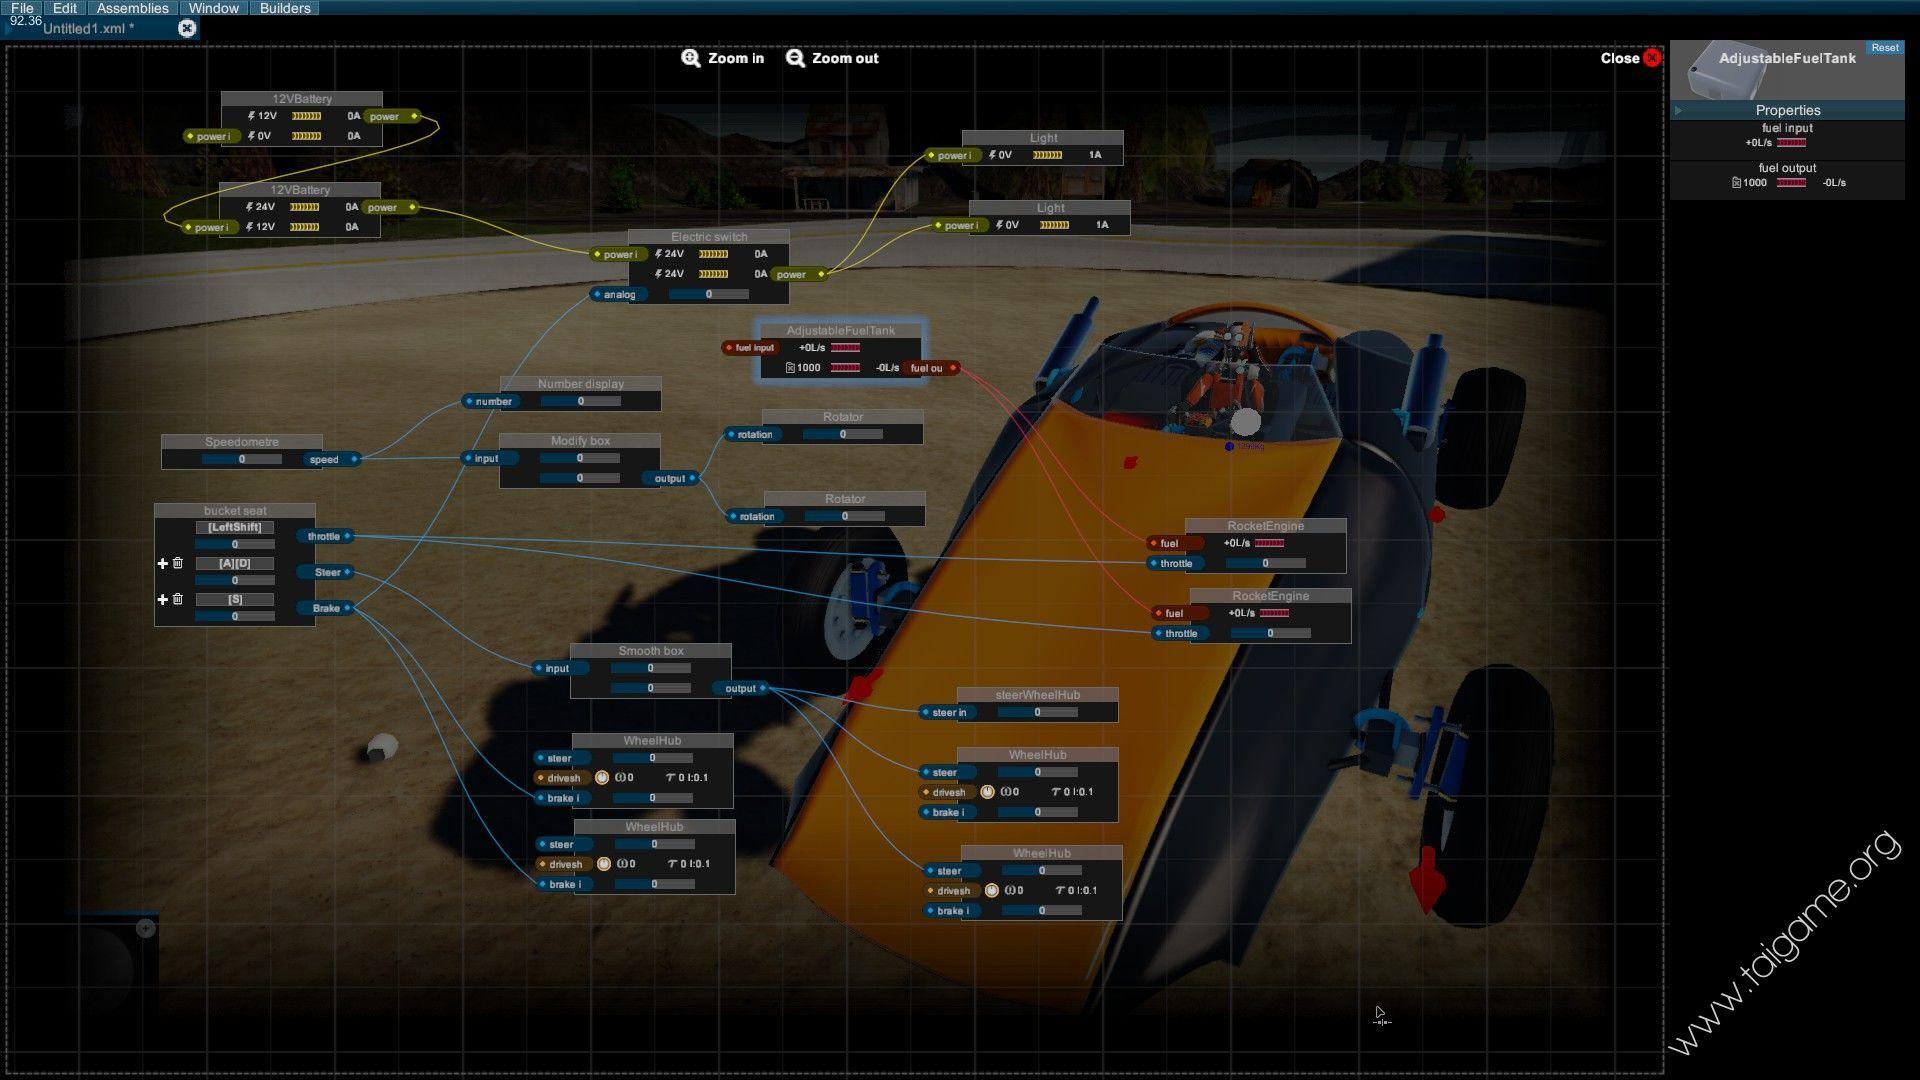 Homebrew - Vehicle Sandbox - Download Free Full Games | Arcade